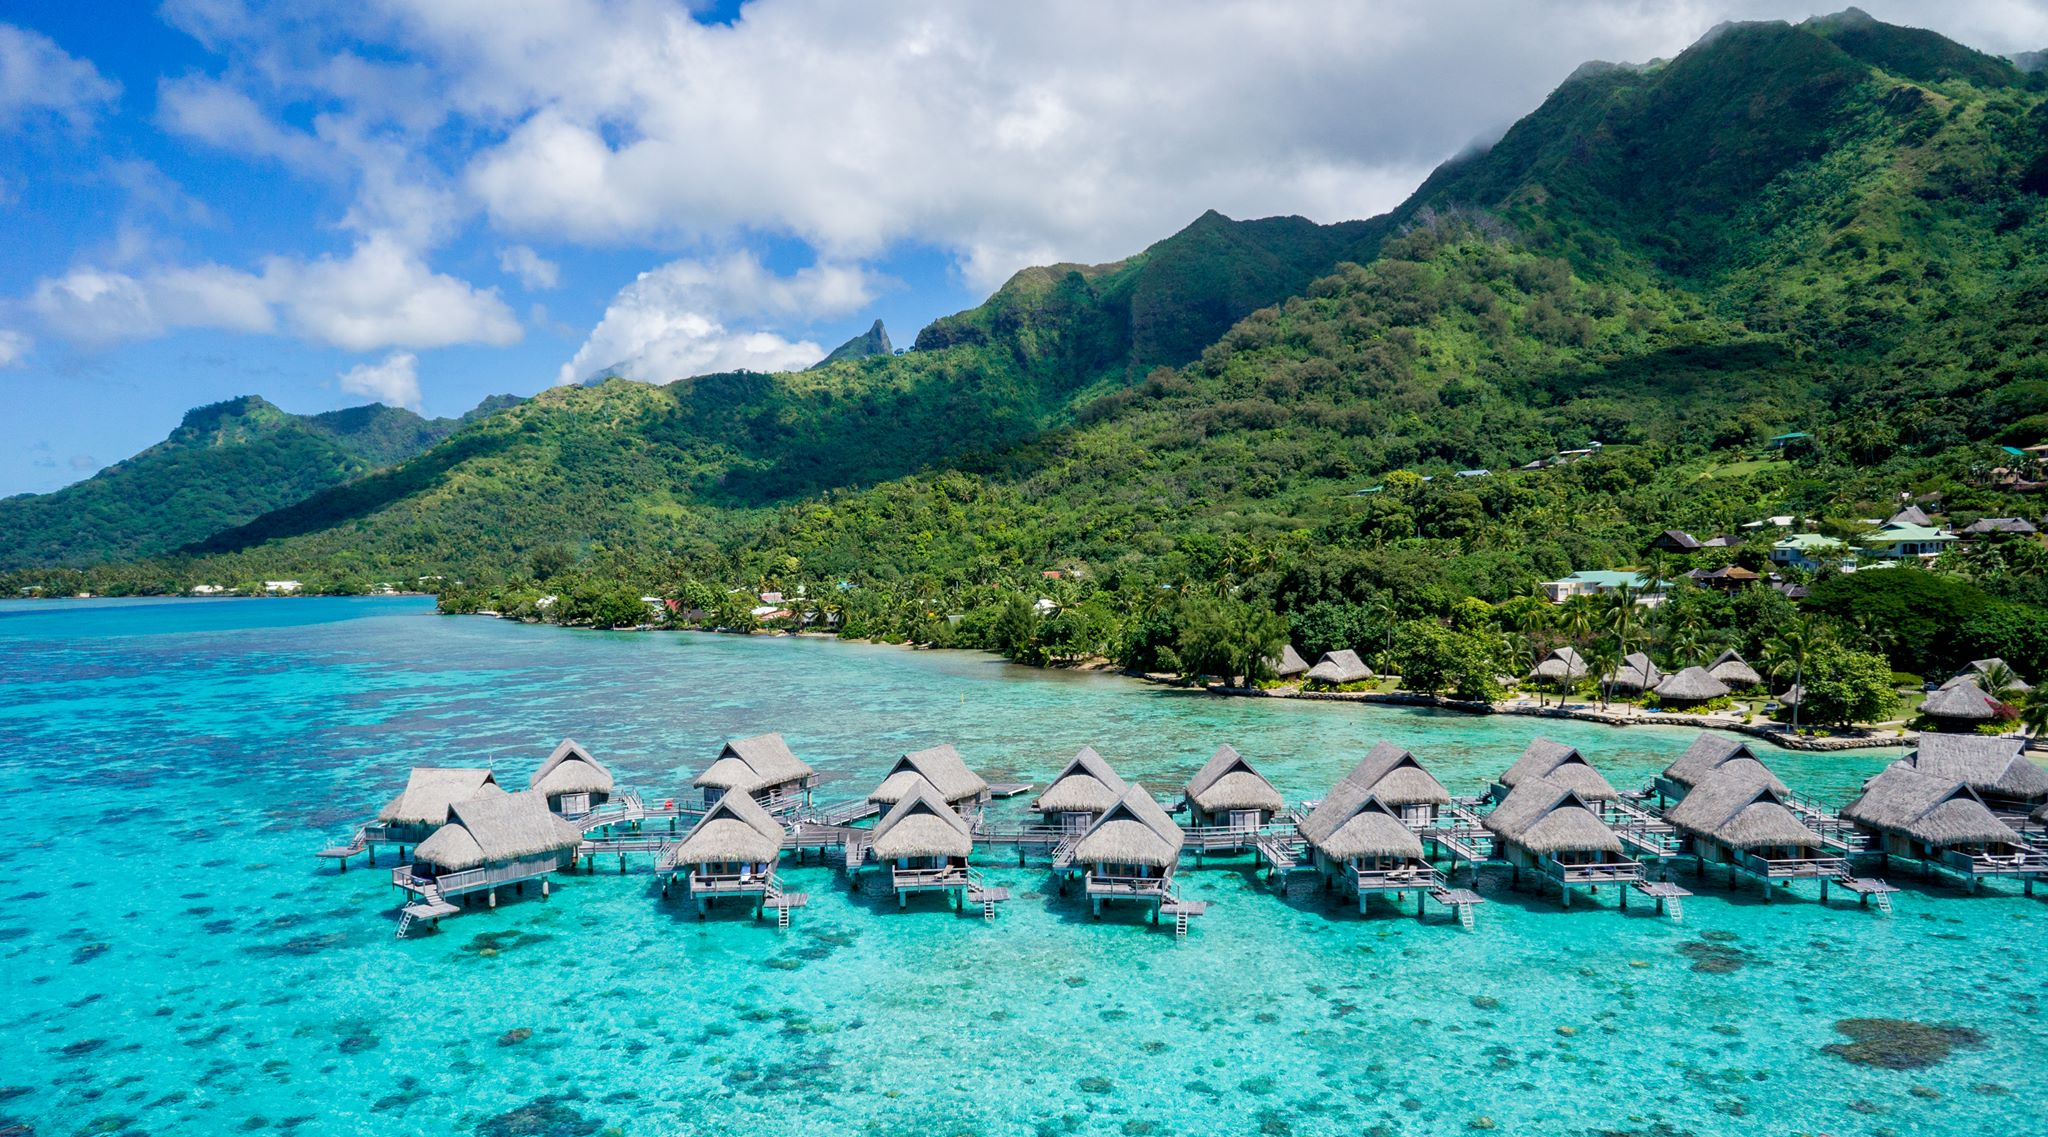 Sofitel Moorea Ia Ora Beach Resort Rooms